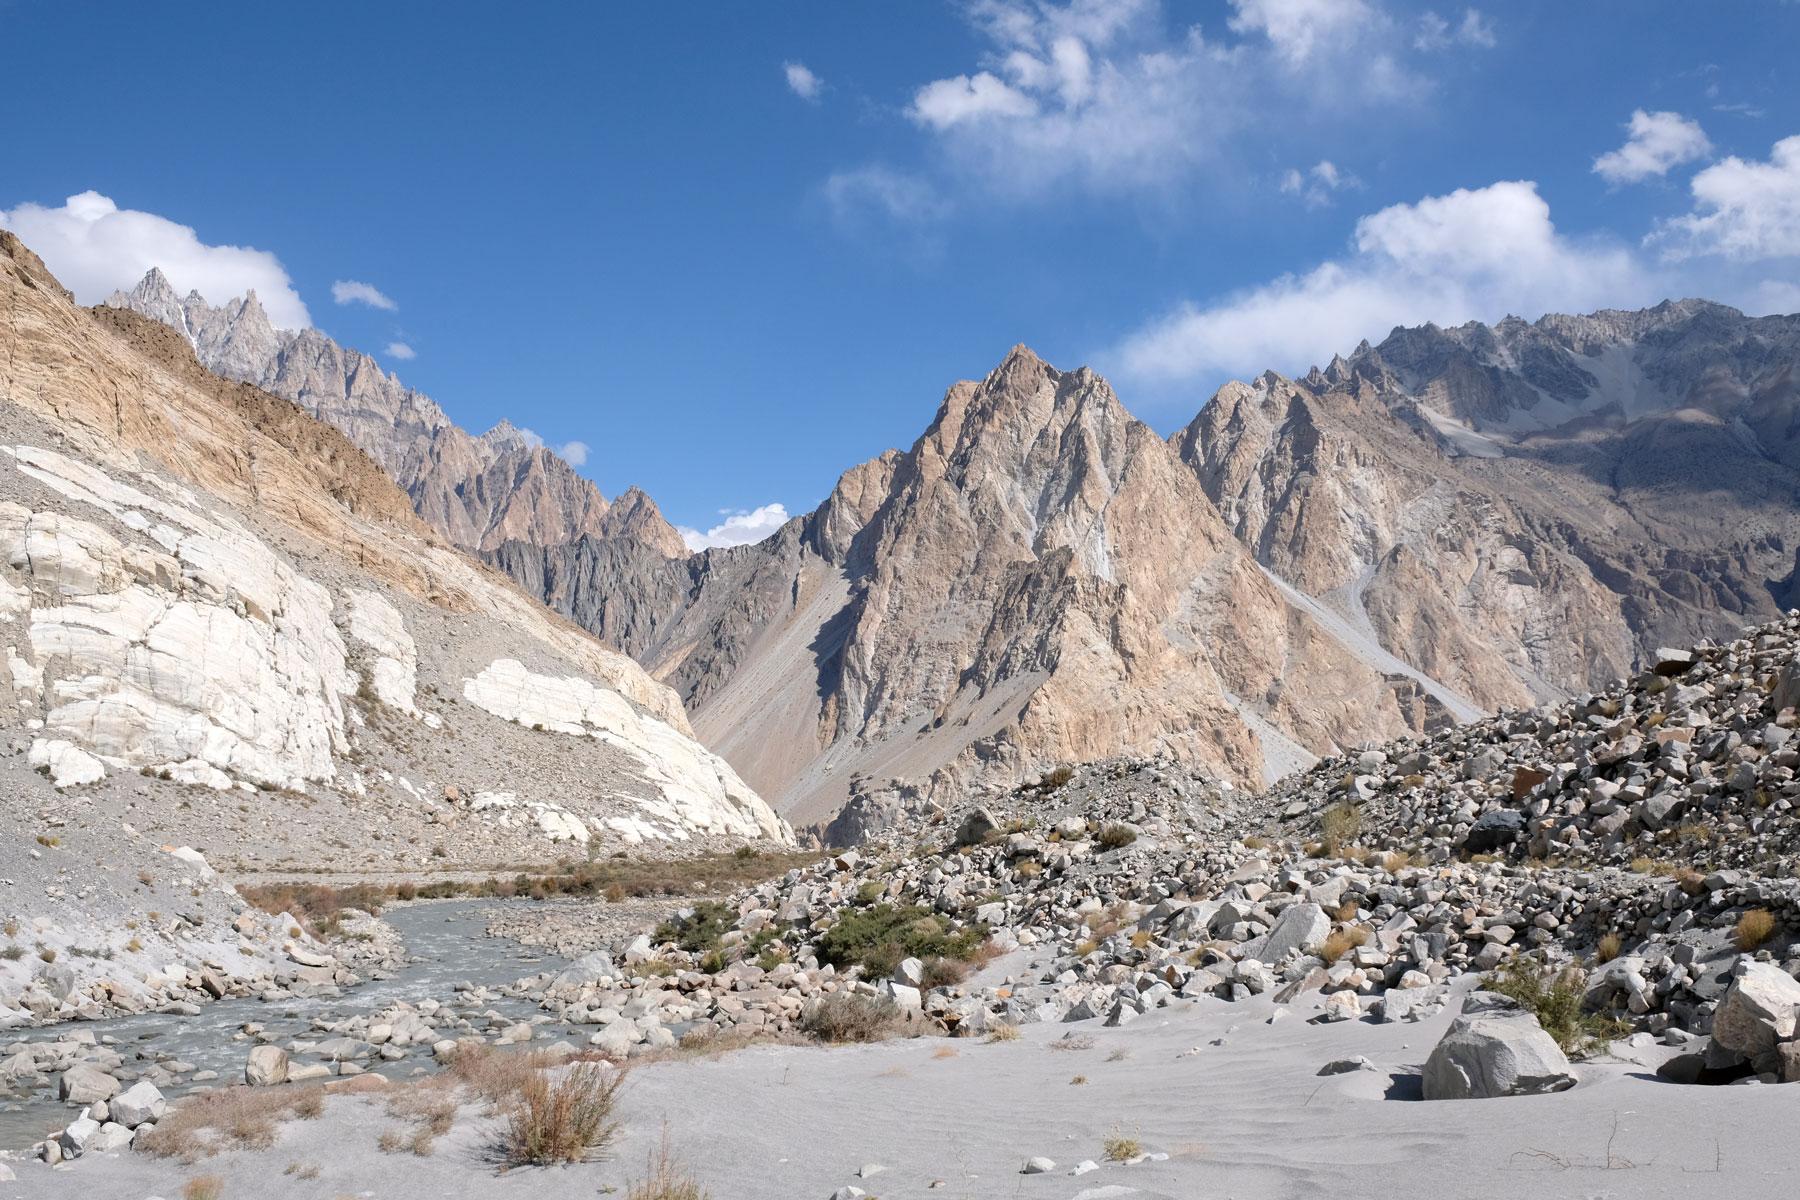 Berge im pakistanischen Karakorumgebirge.